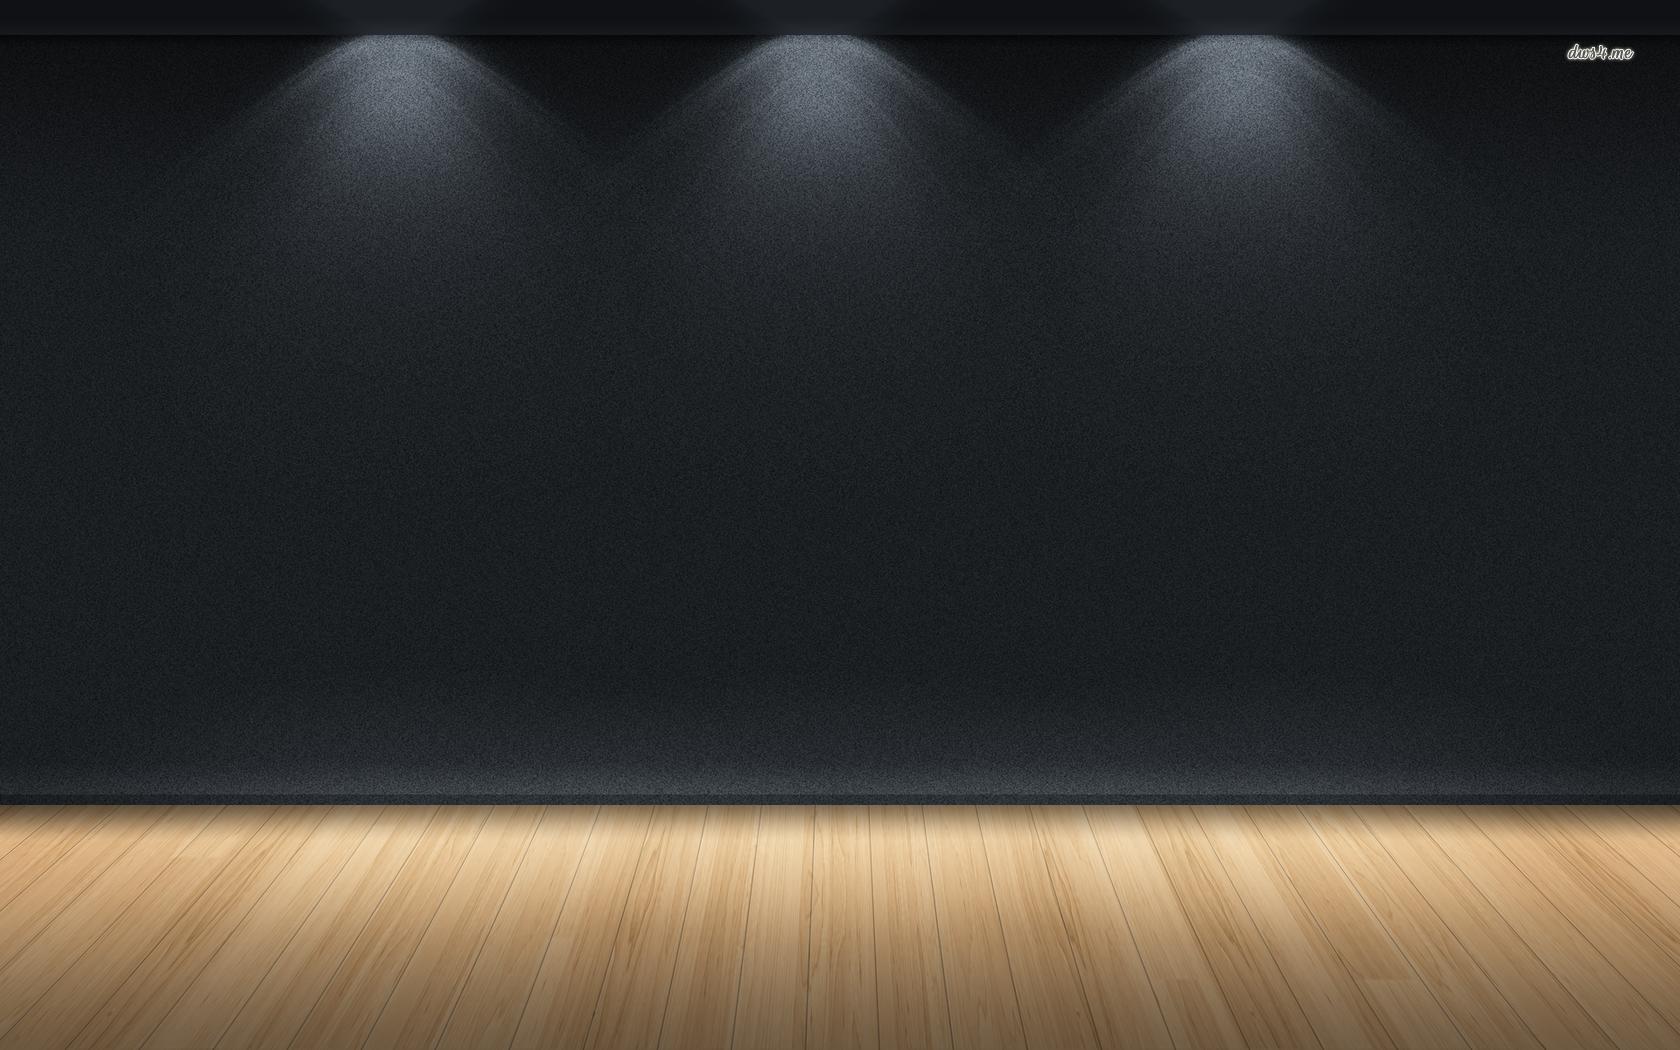 Best 3d Wallpaper Download App Stage Backgrounds Image Wallpaper Cave